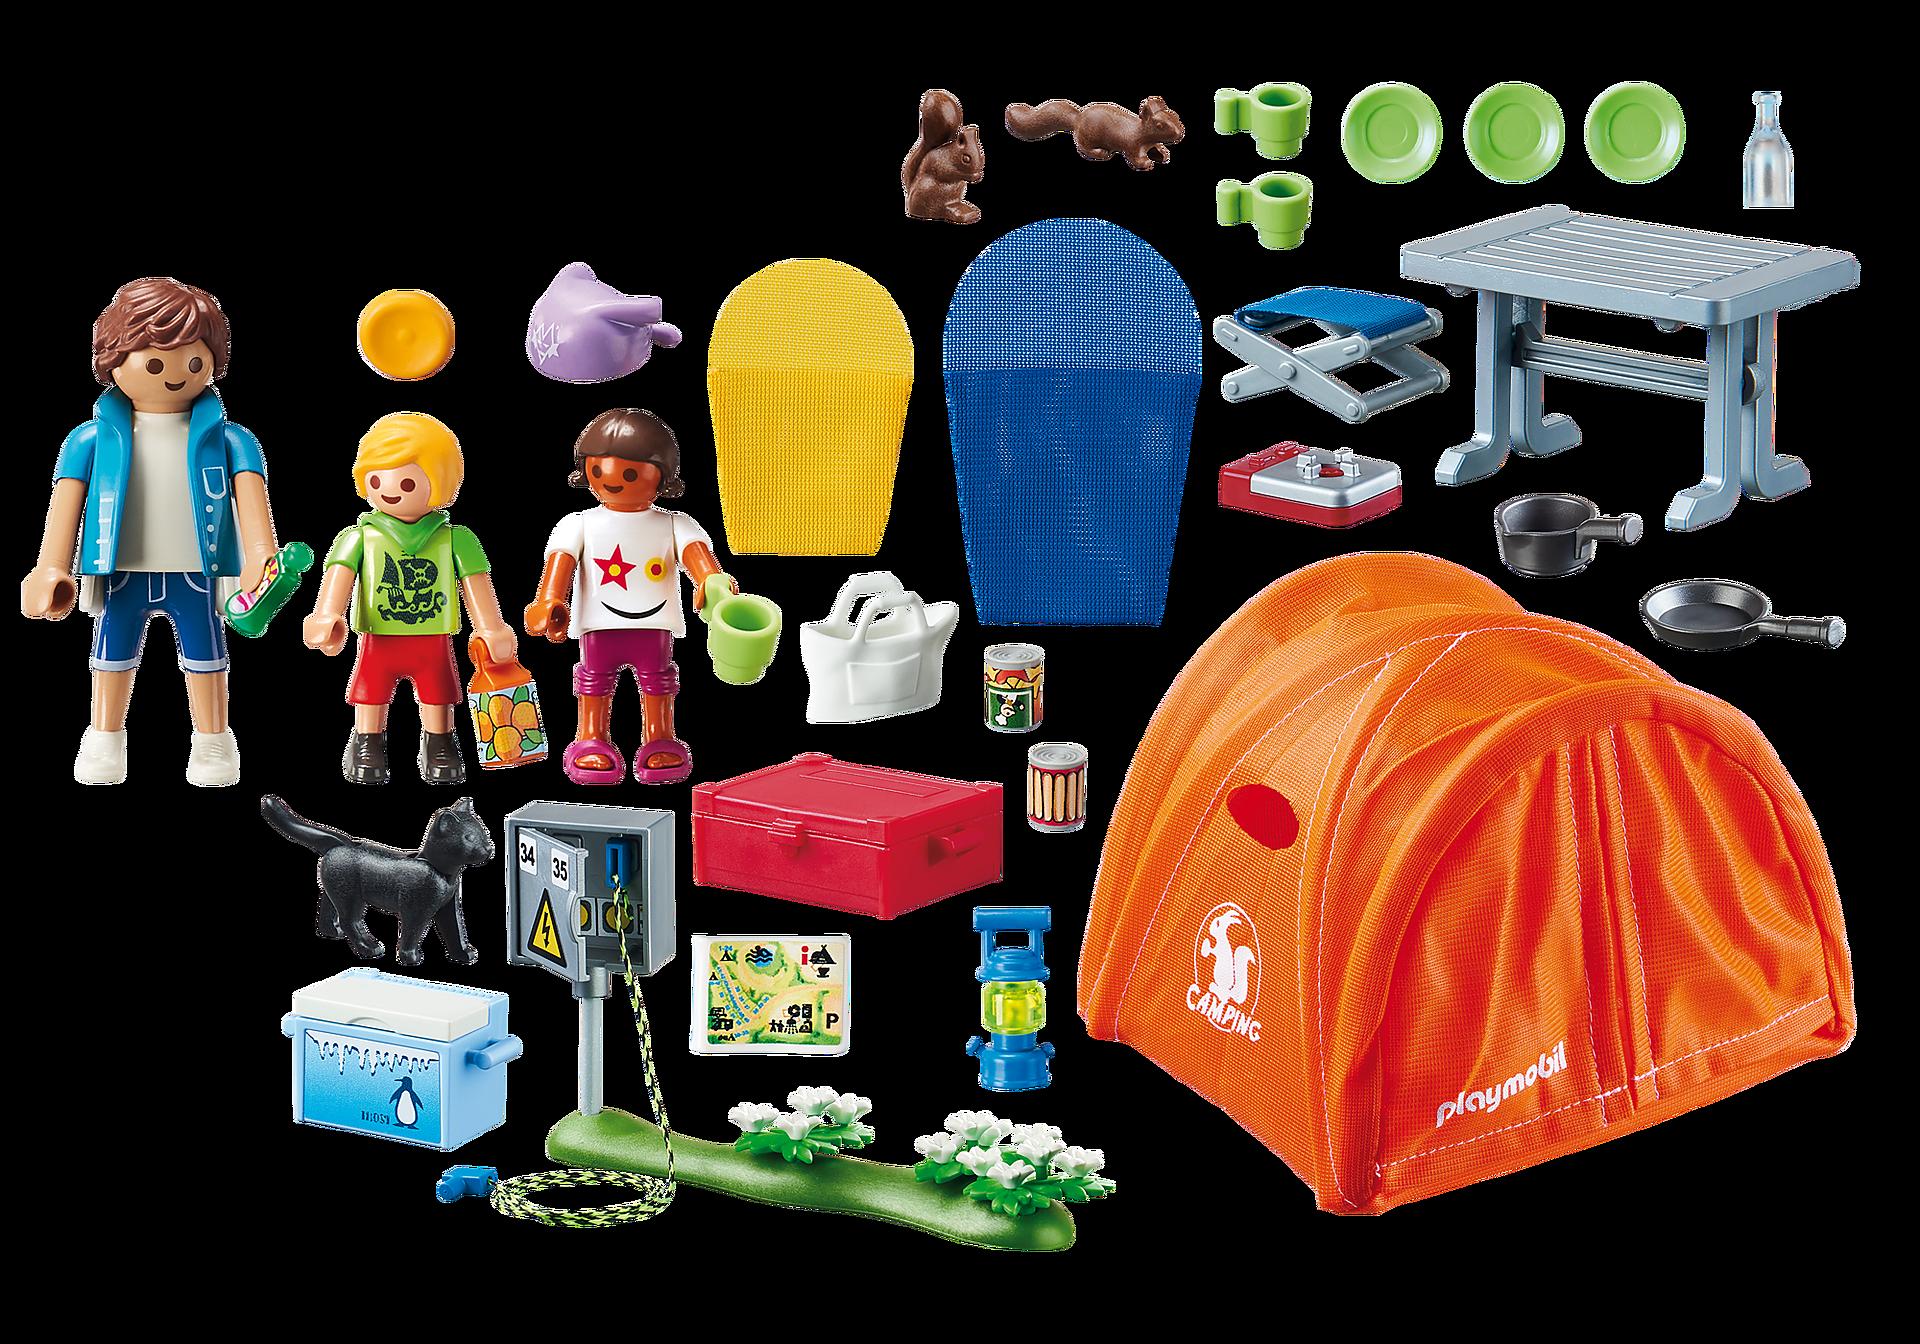 70089 Tente et campeurs zoom image3